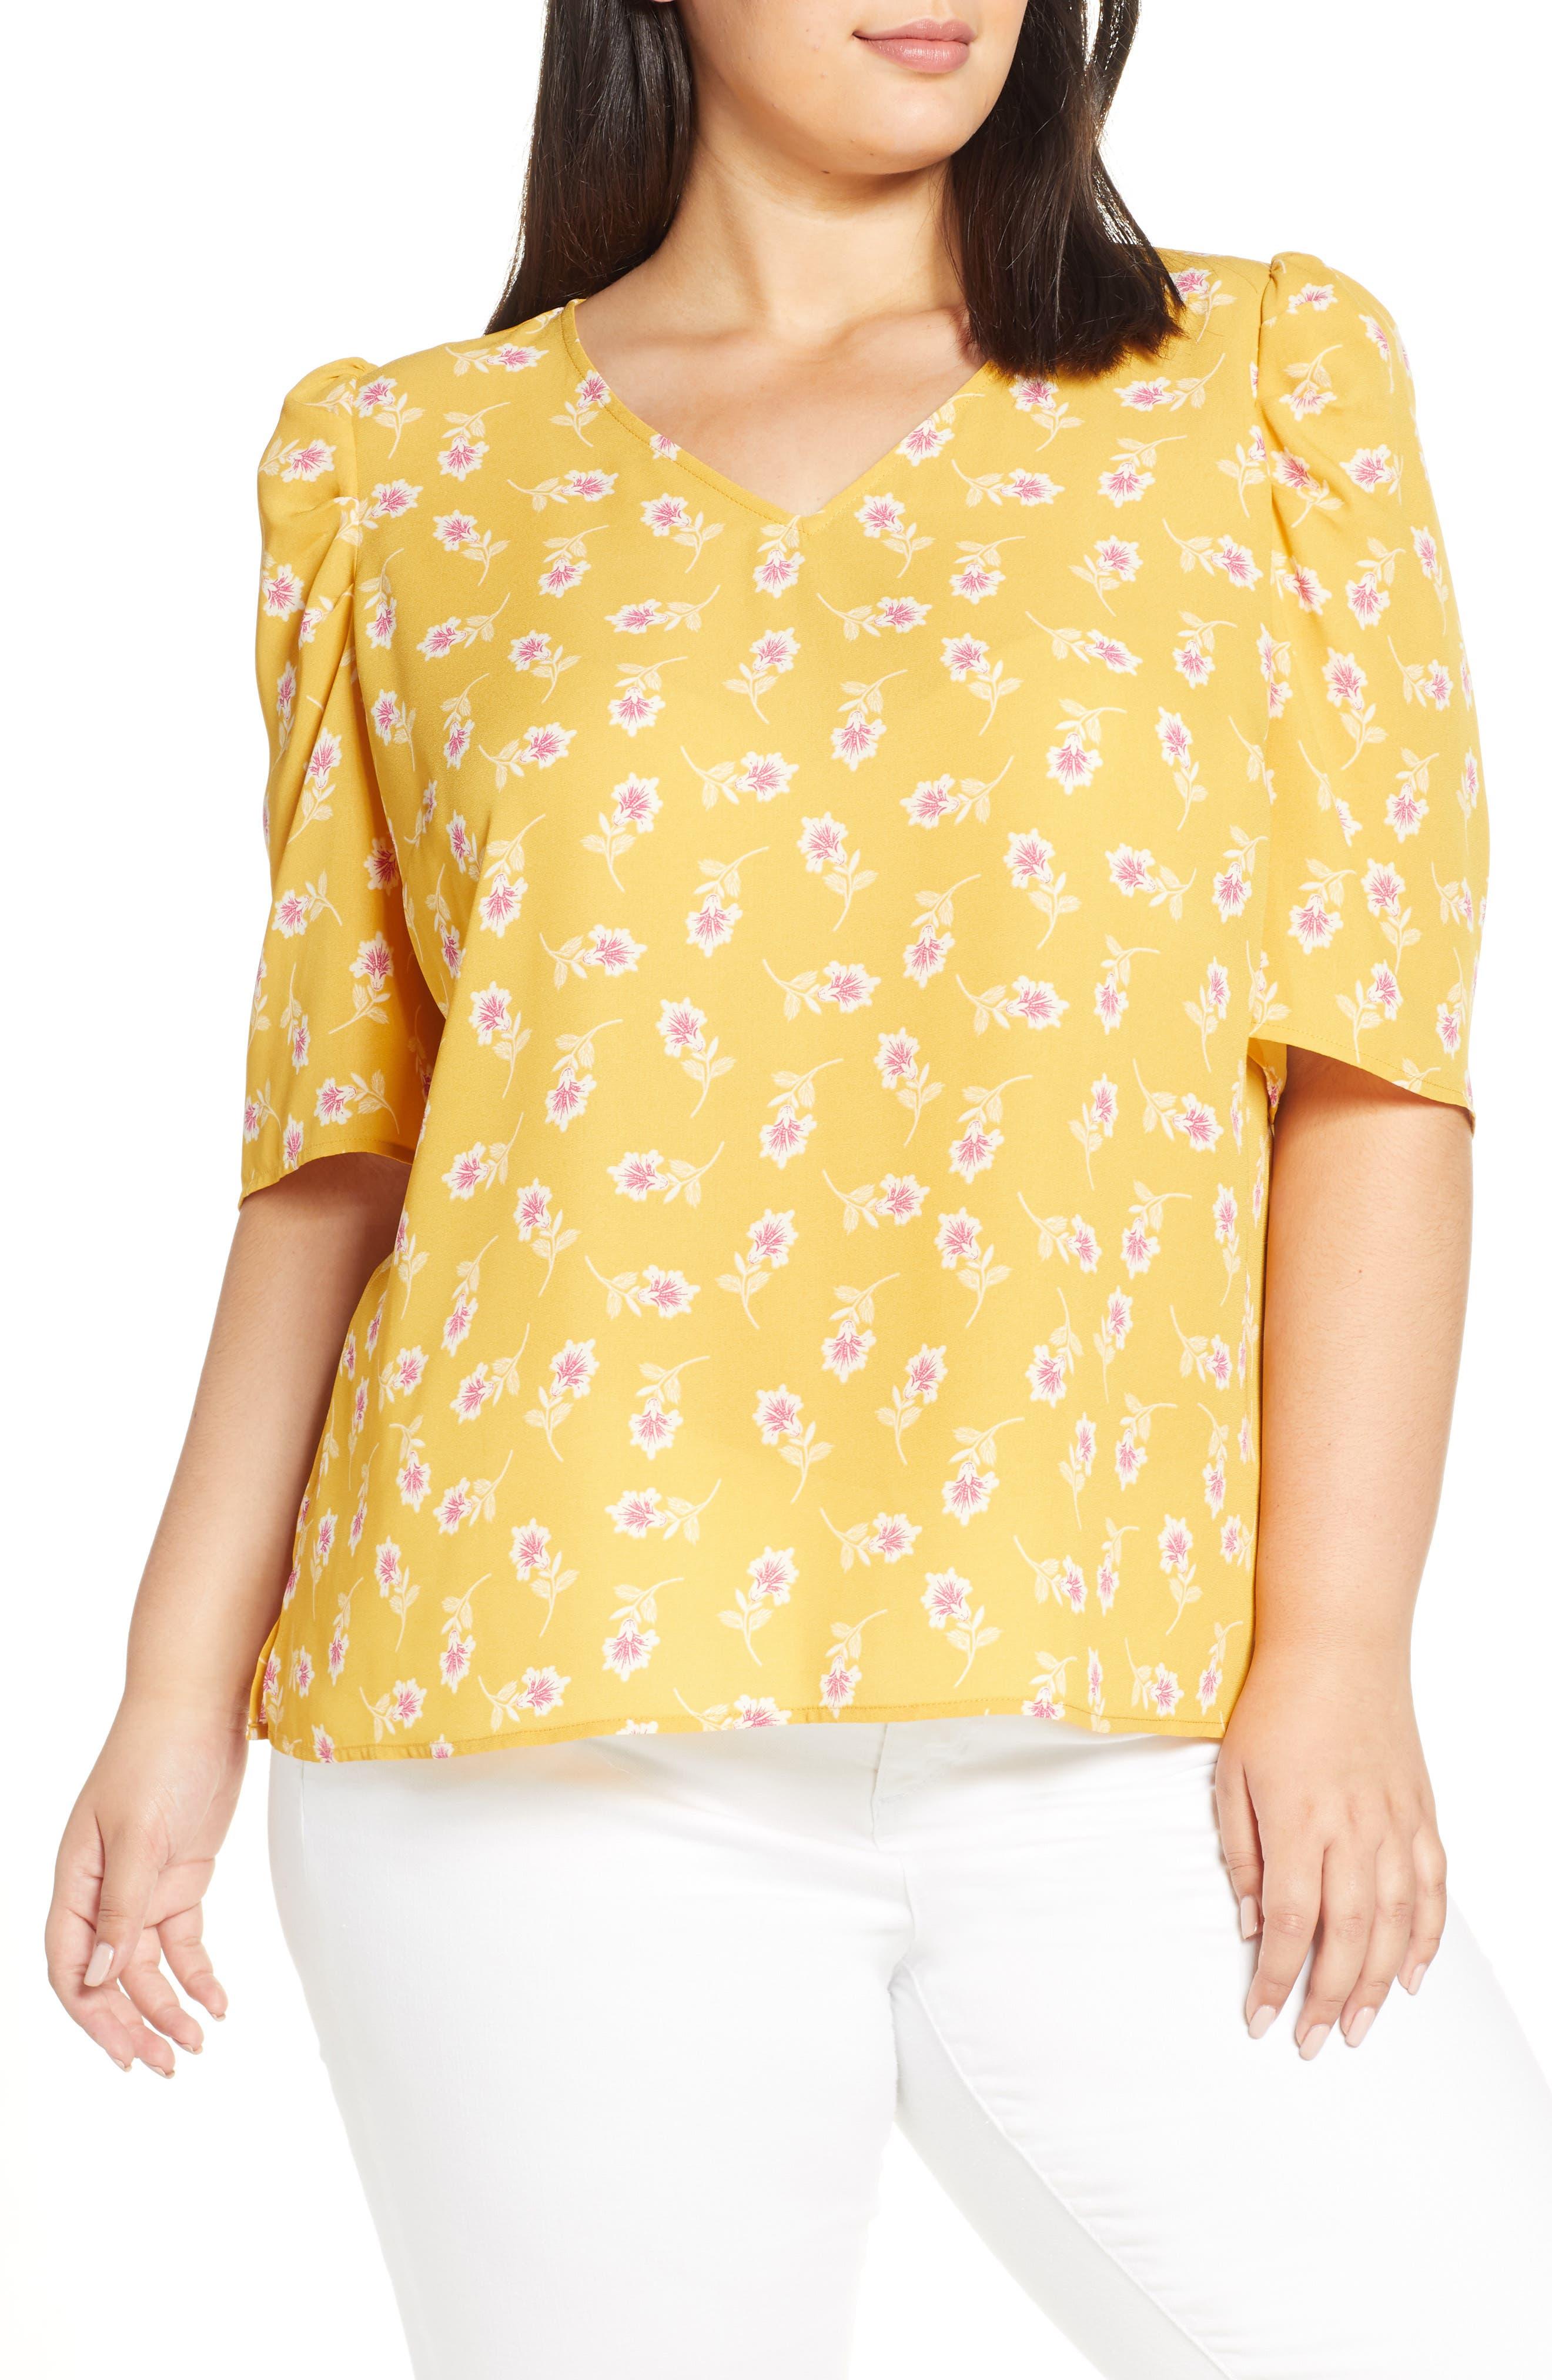 1930s Style Blouses, Shirts, Tops | Vintage Blouses Plus Size Womens Vince Camuto Floral Puff Shoulder Top Size 3X - Yellow $89.00 AT vintagedancer.com